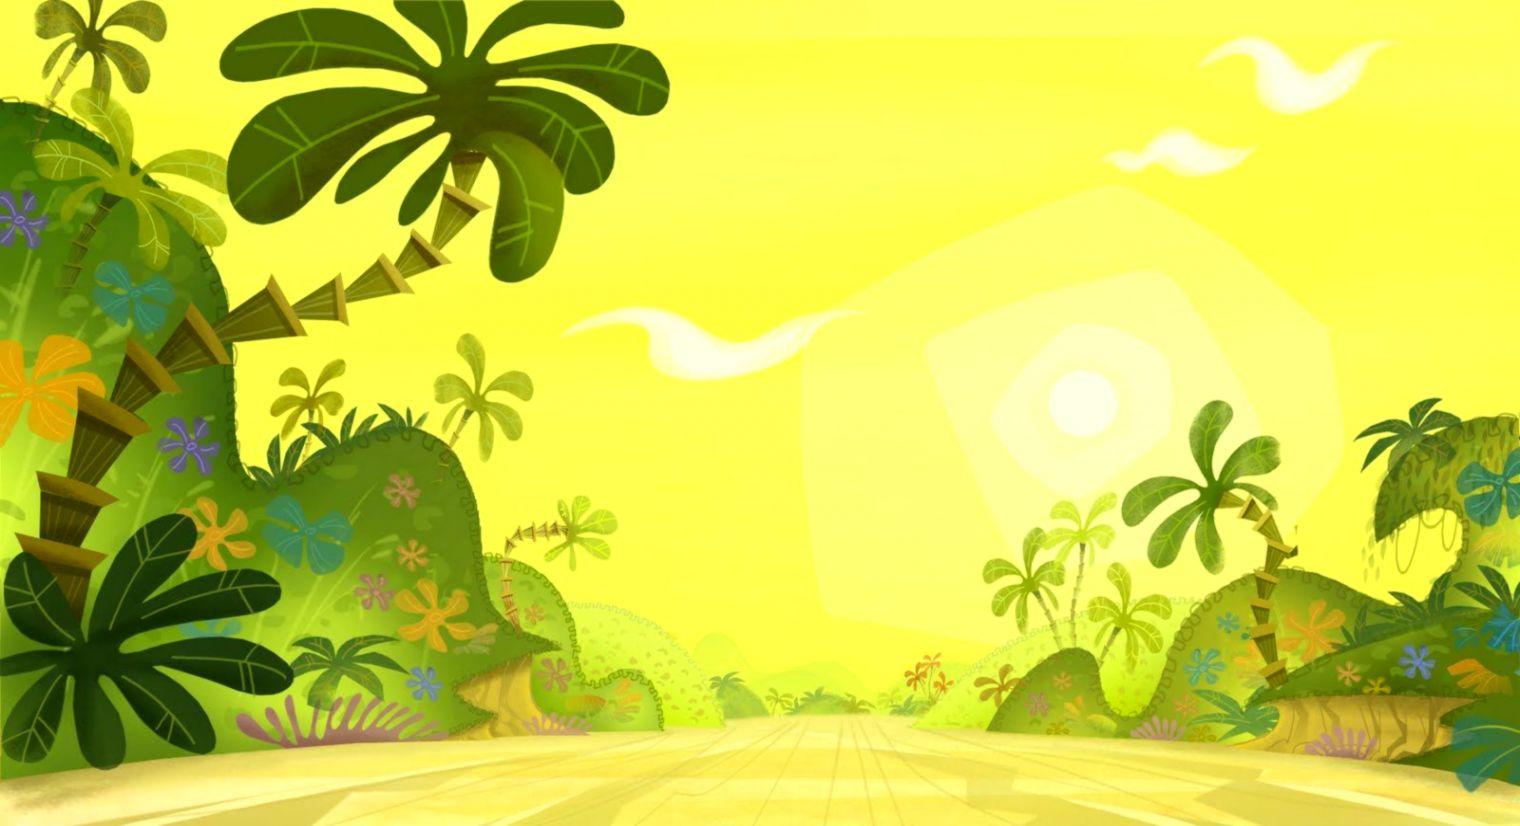 Download 94 Koleksi Background Hd Cartoon HD Terbaru